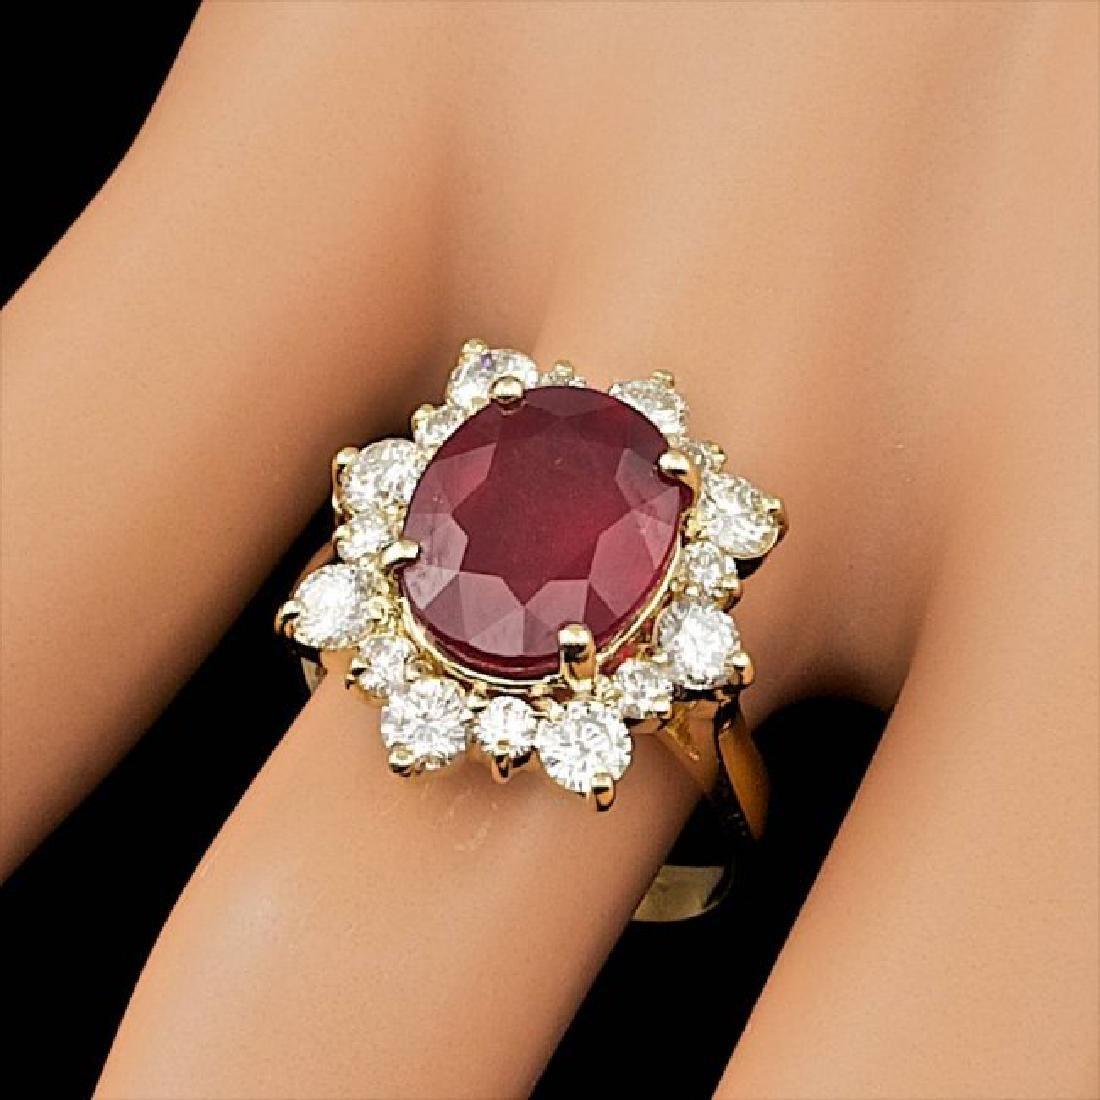 14k Yellow Gold 5.50ct Ruby 1.35ct Diamond Ring - 3